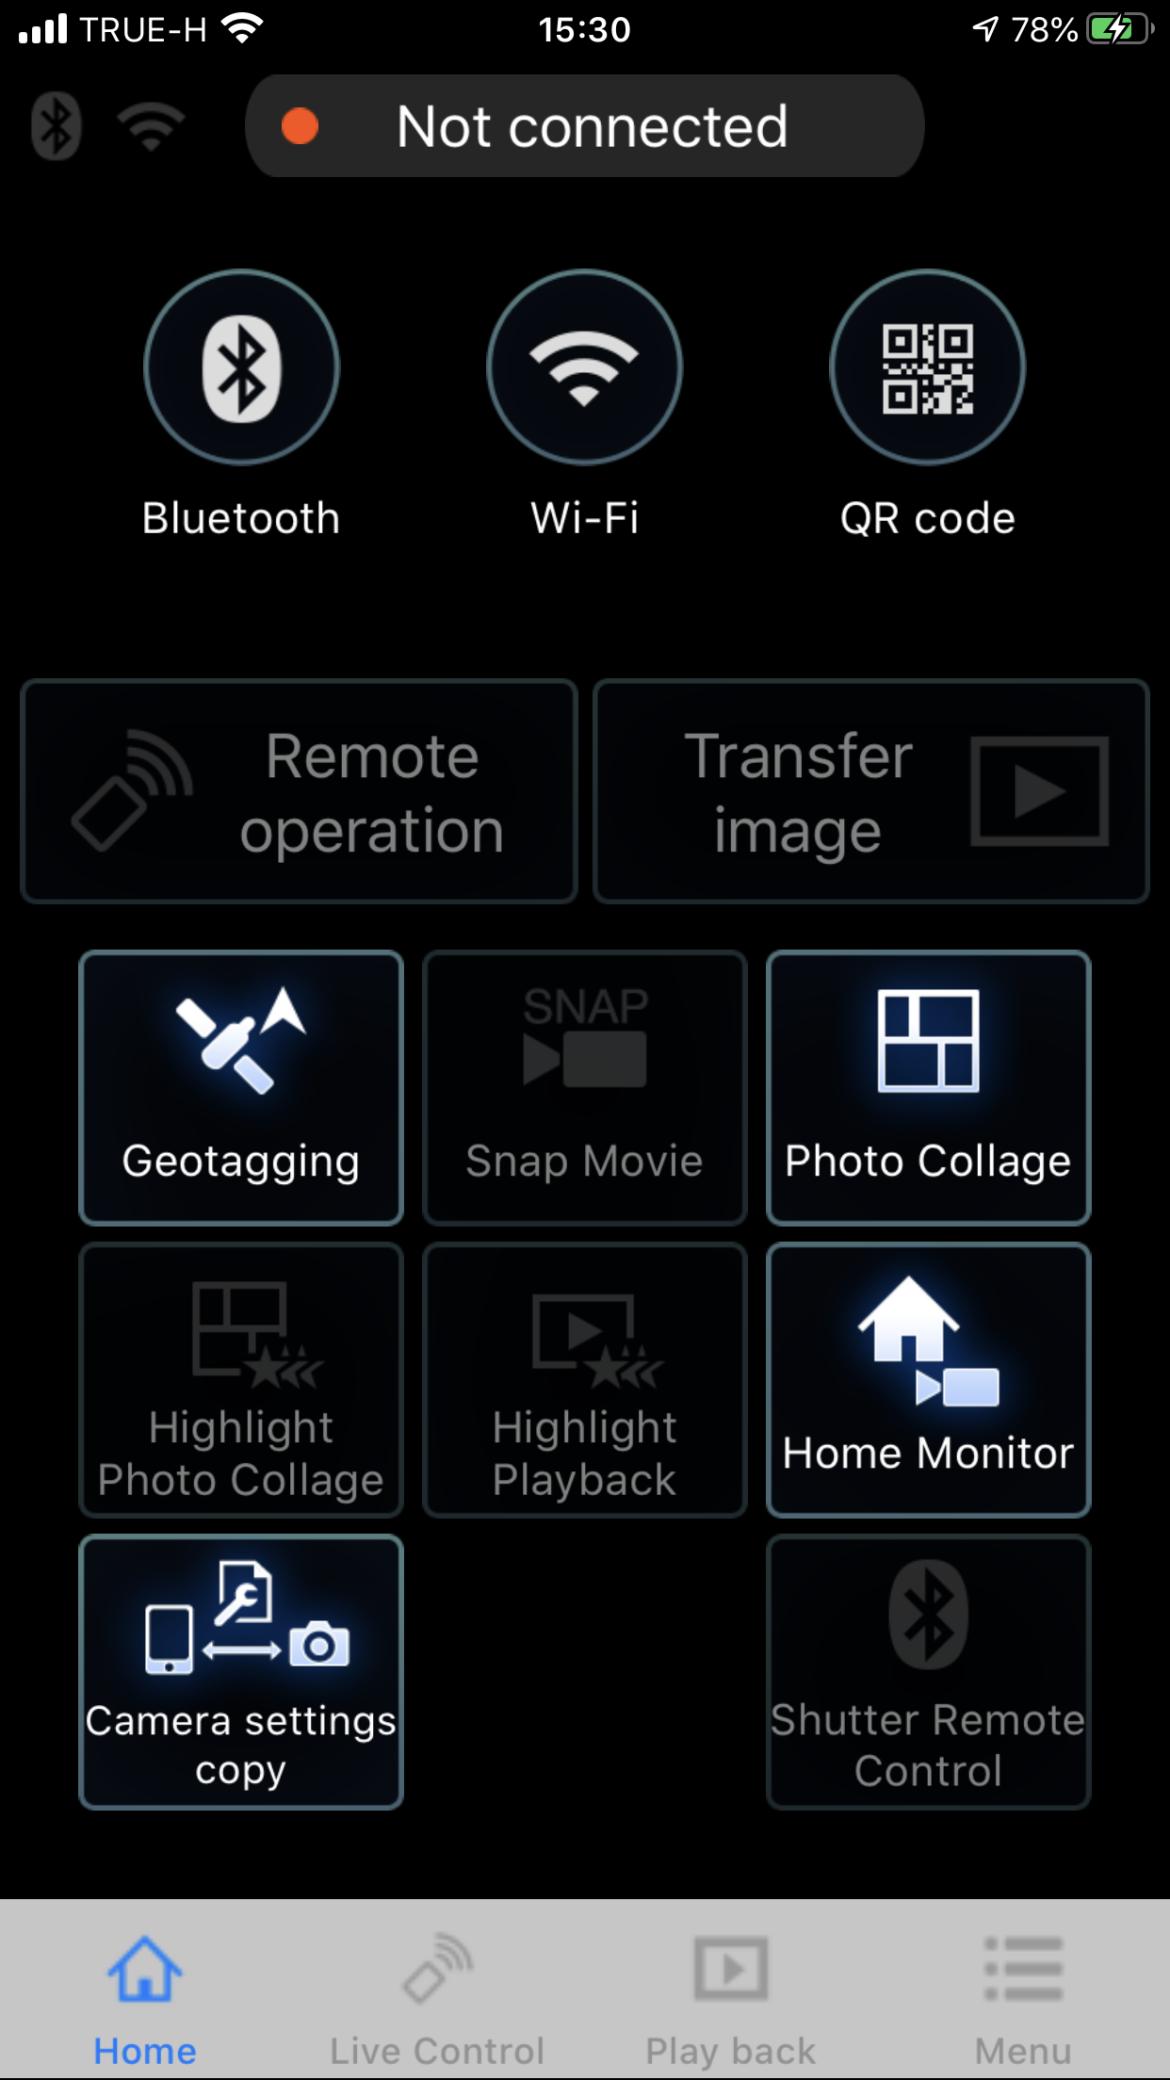 Application สำหรับคนที่ใช้กล้อง Panasonic